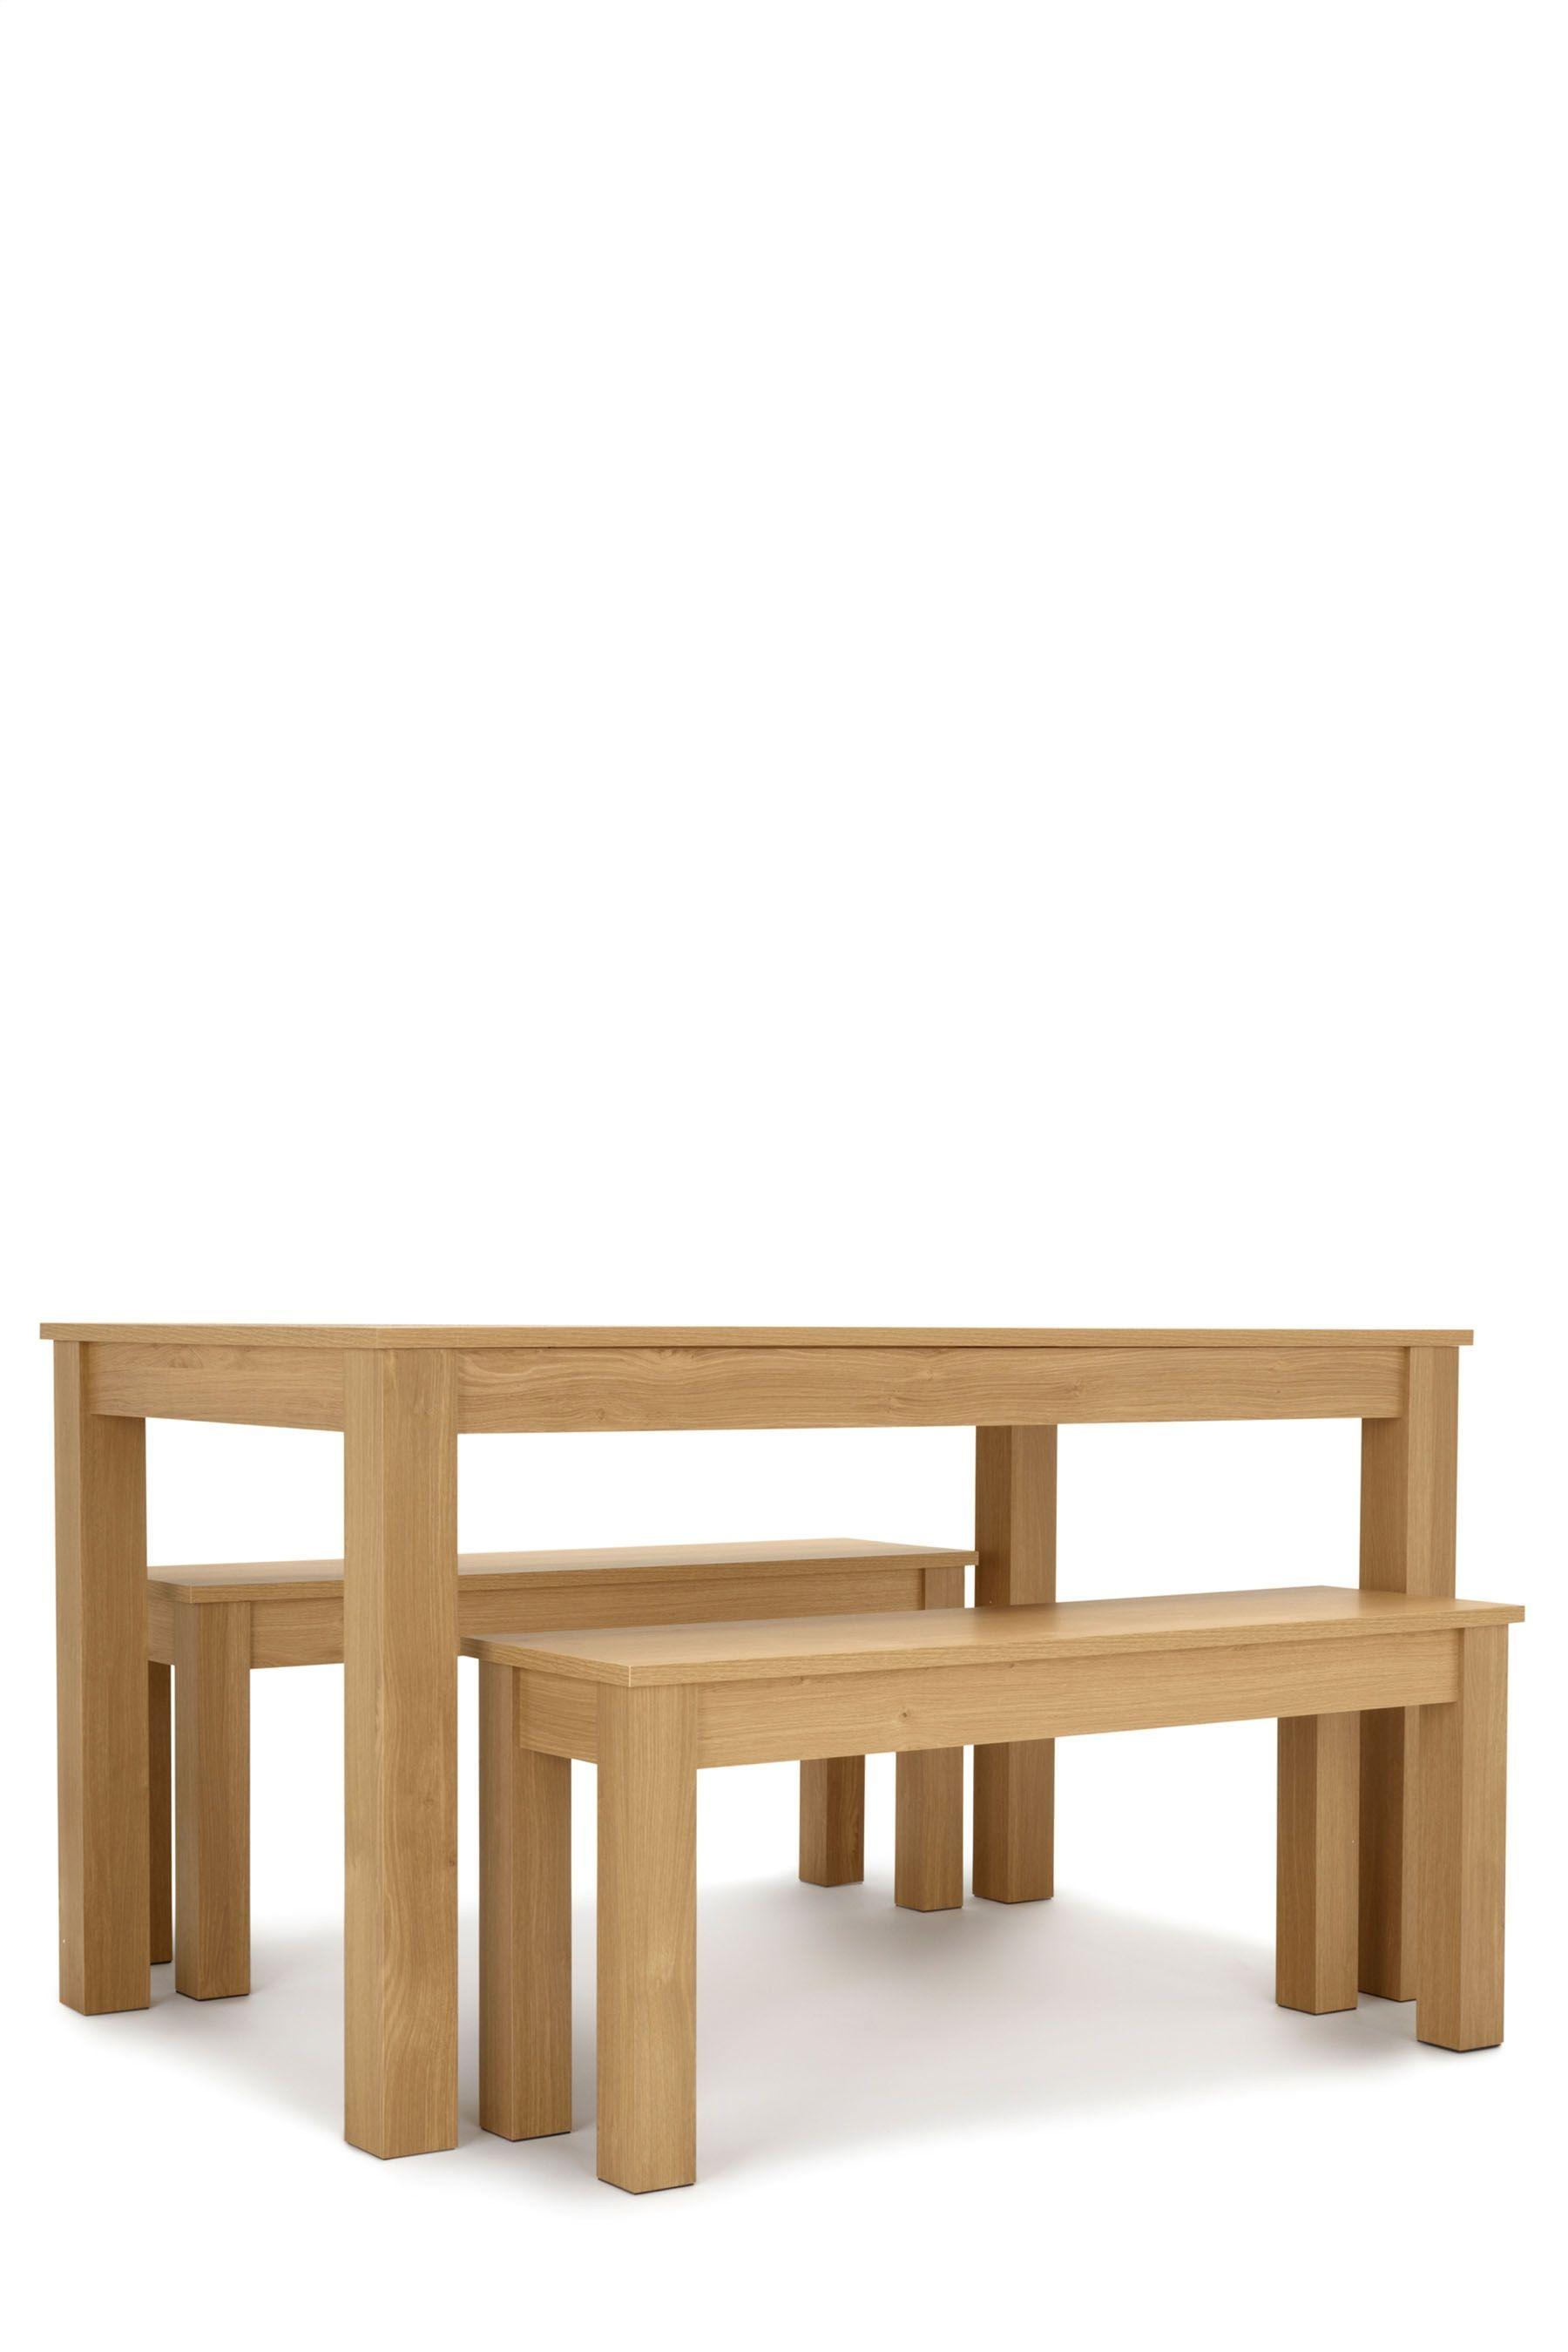 Buy Stanton Bench Set from the Next UK online shop